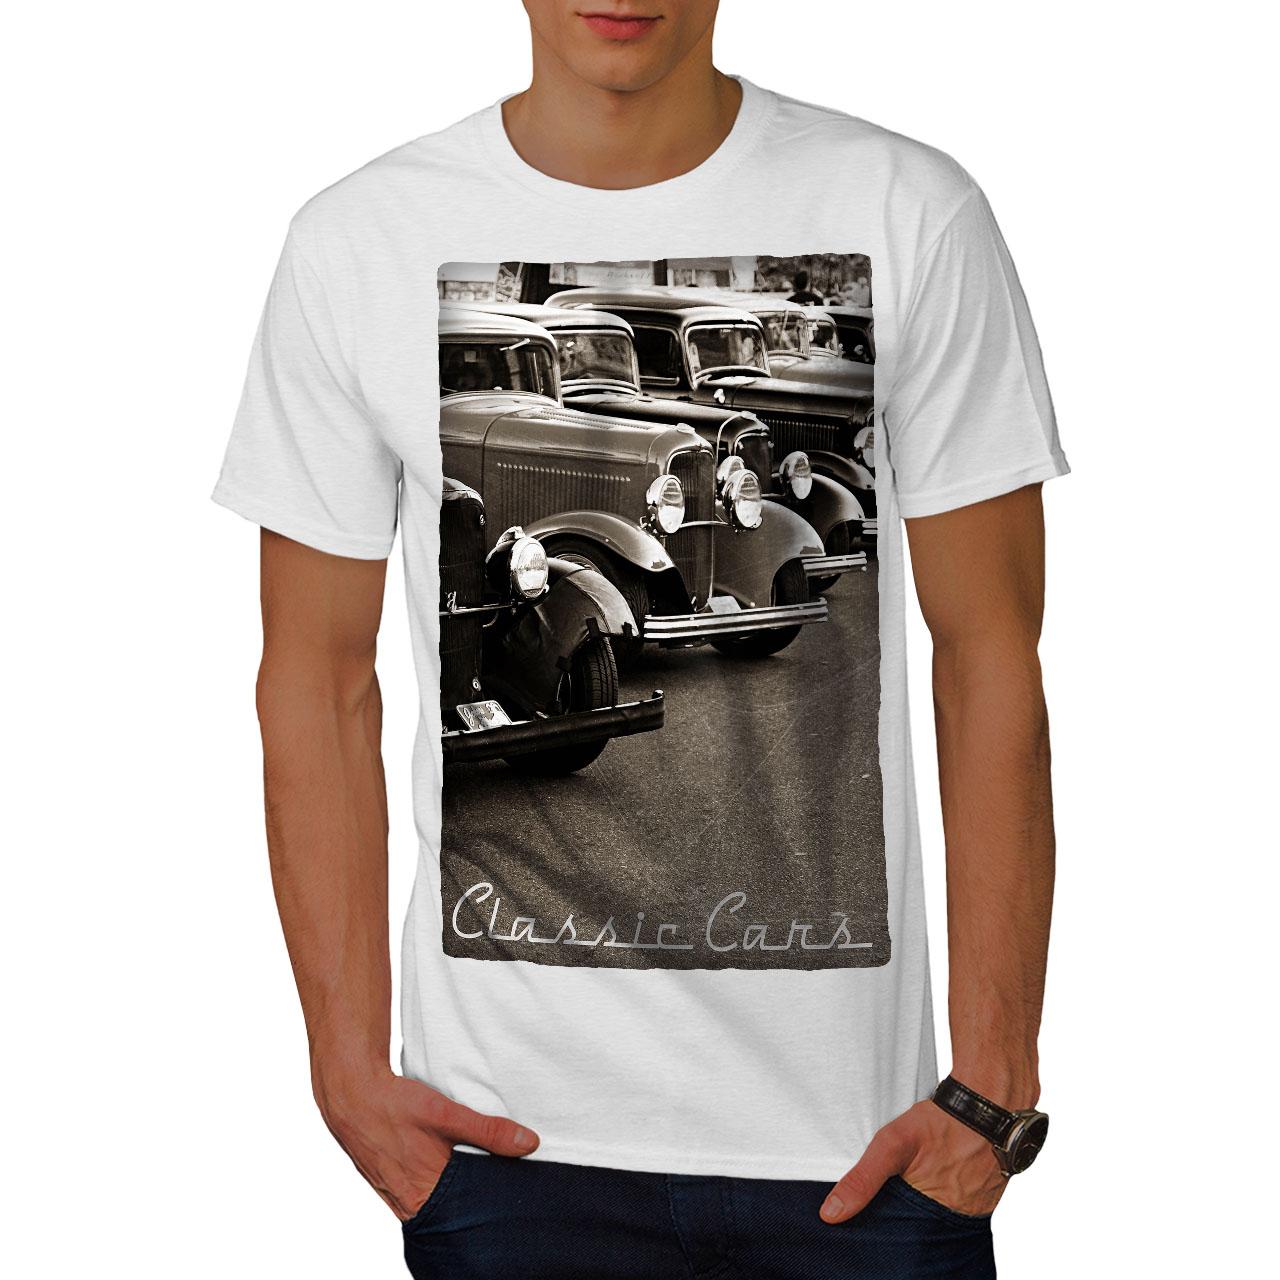 Wellcoda-Classic-Cars-Mens-T-shirt-Retro-Graphic-Design-Printed-Tee thumbnail 9